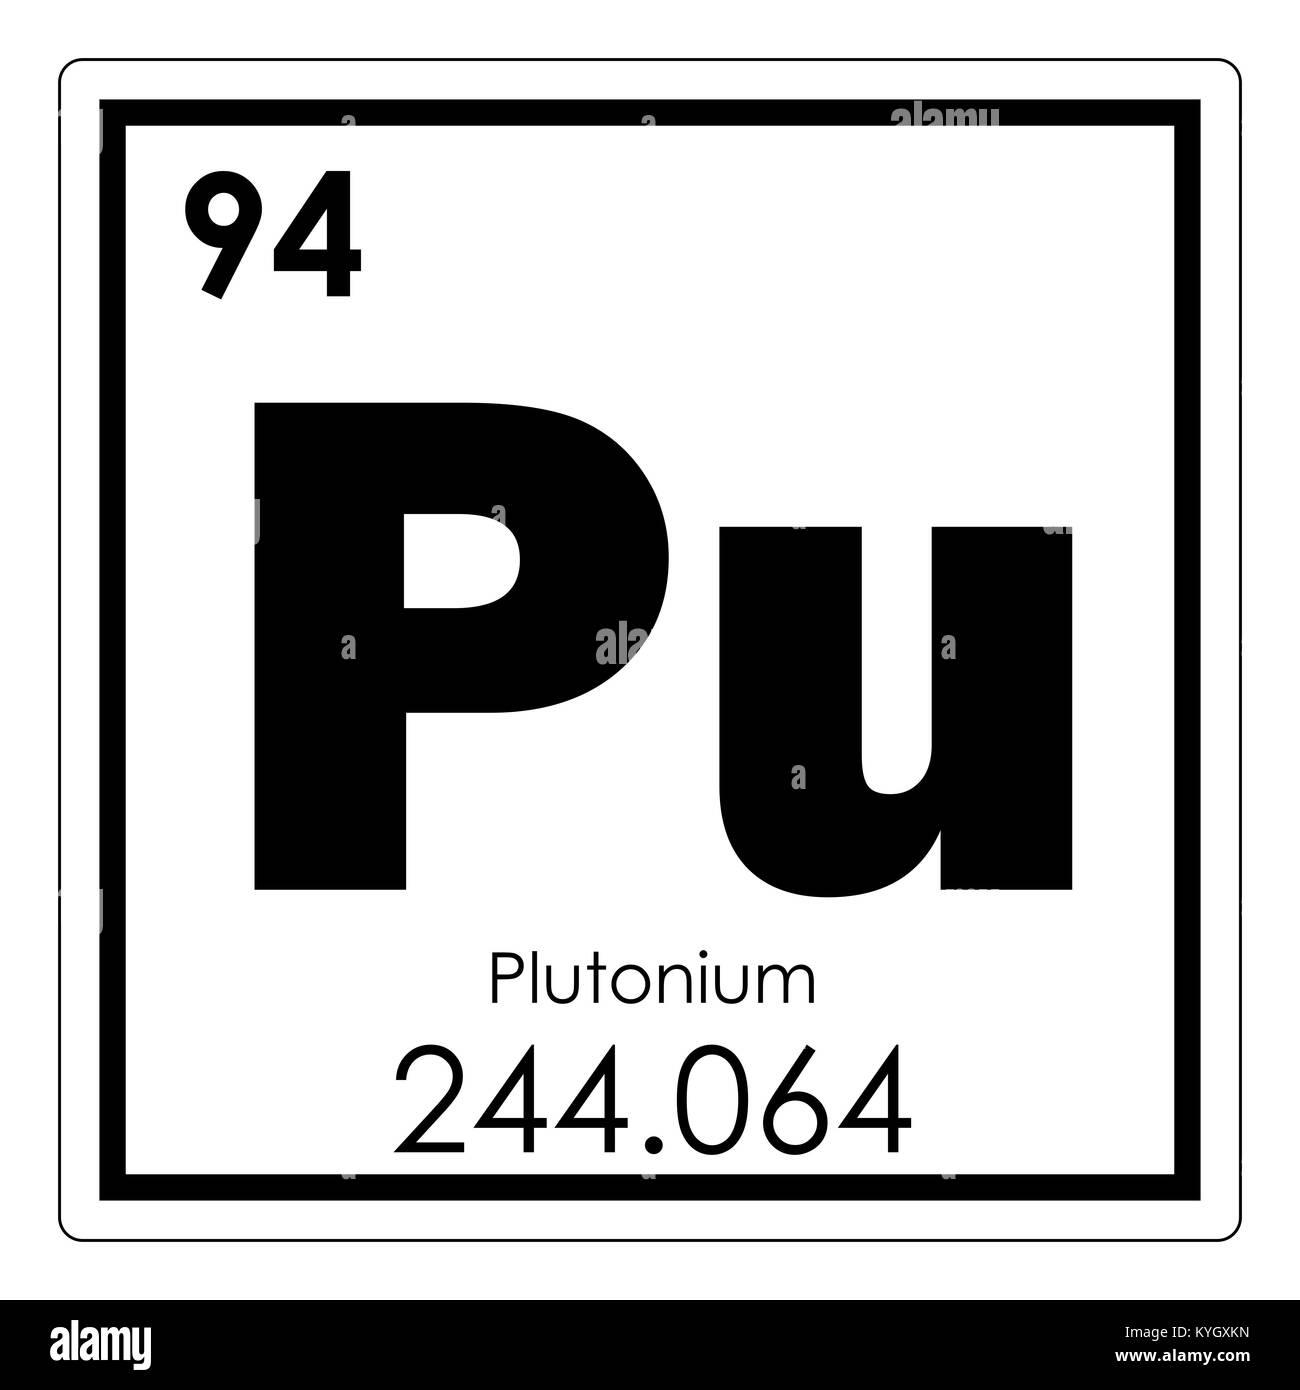 Plutonium Chemical Element Periodic Table Science Symbol Stock Photo